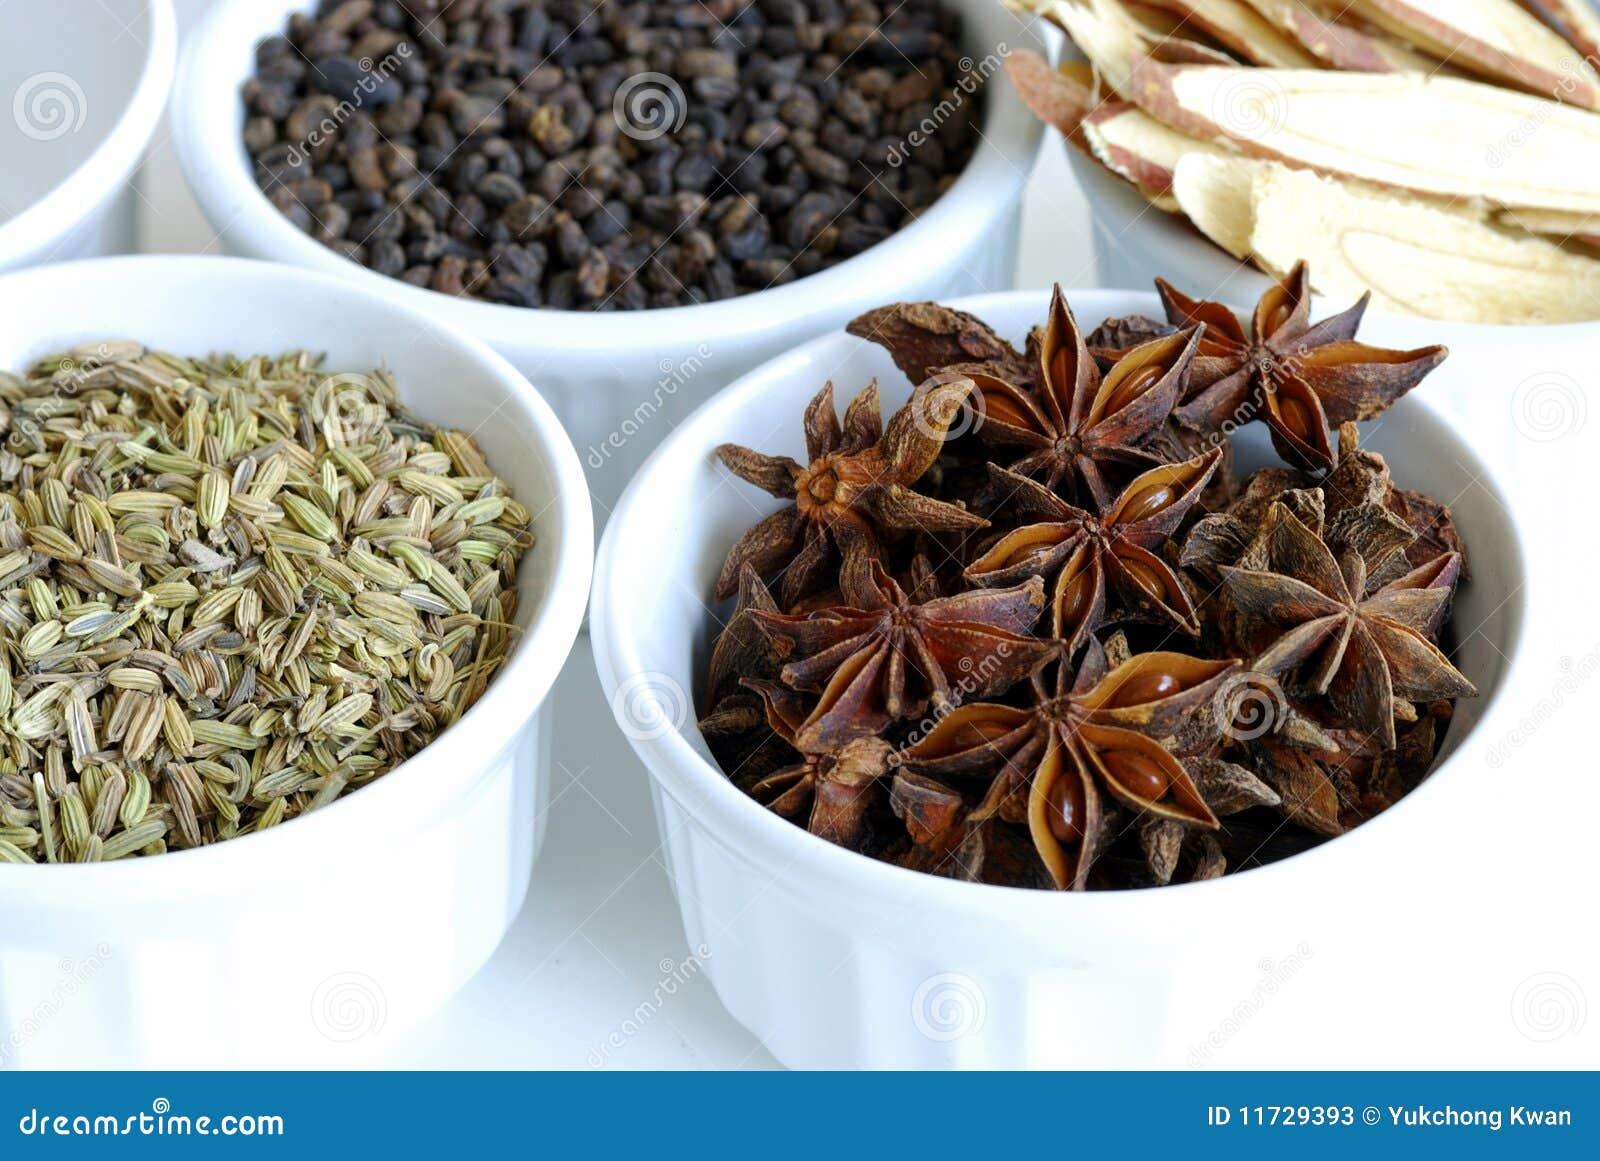 Divers genres d épices de fines herbes